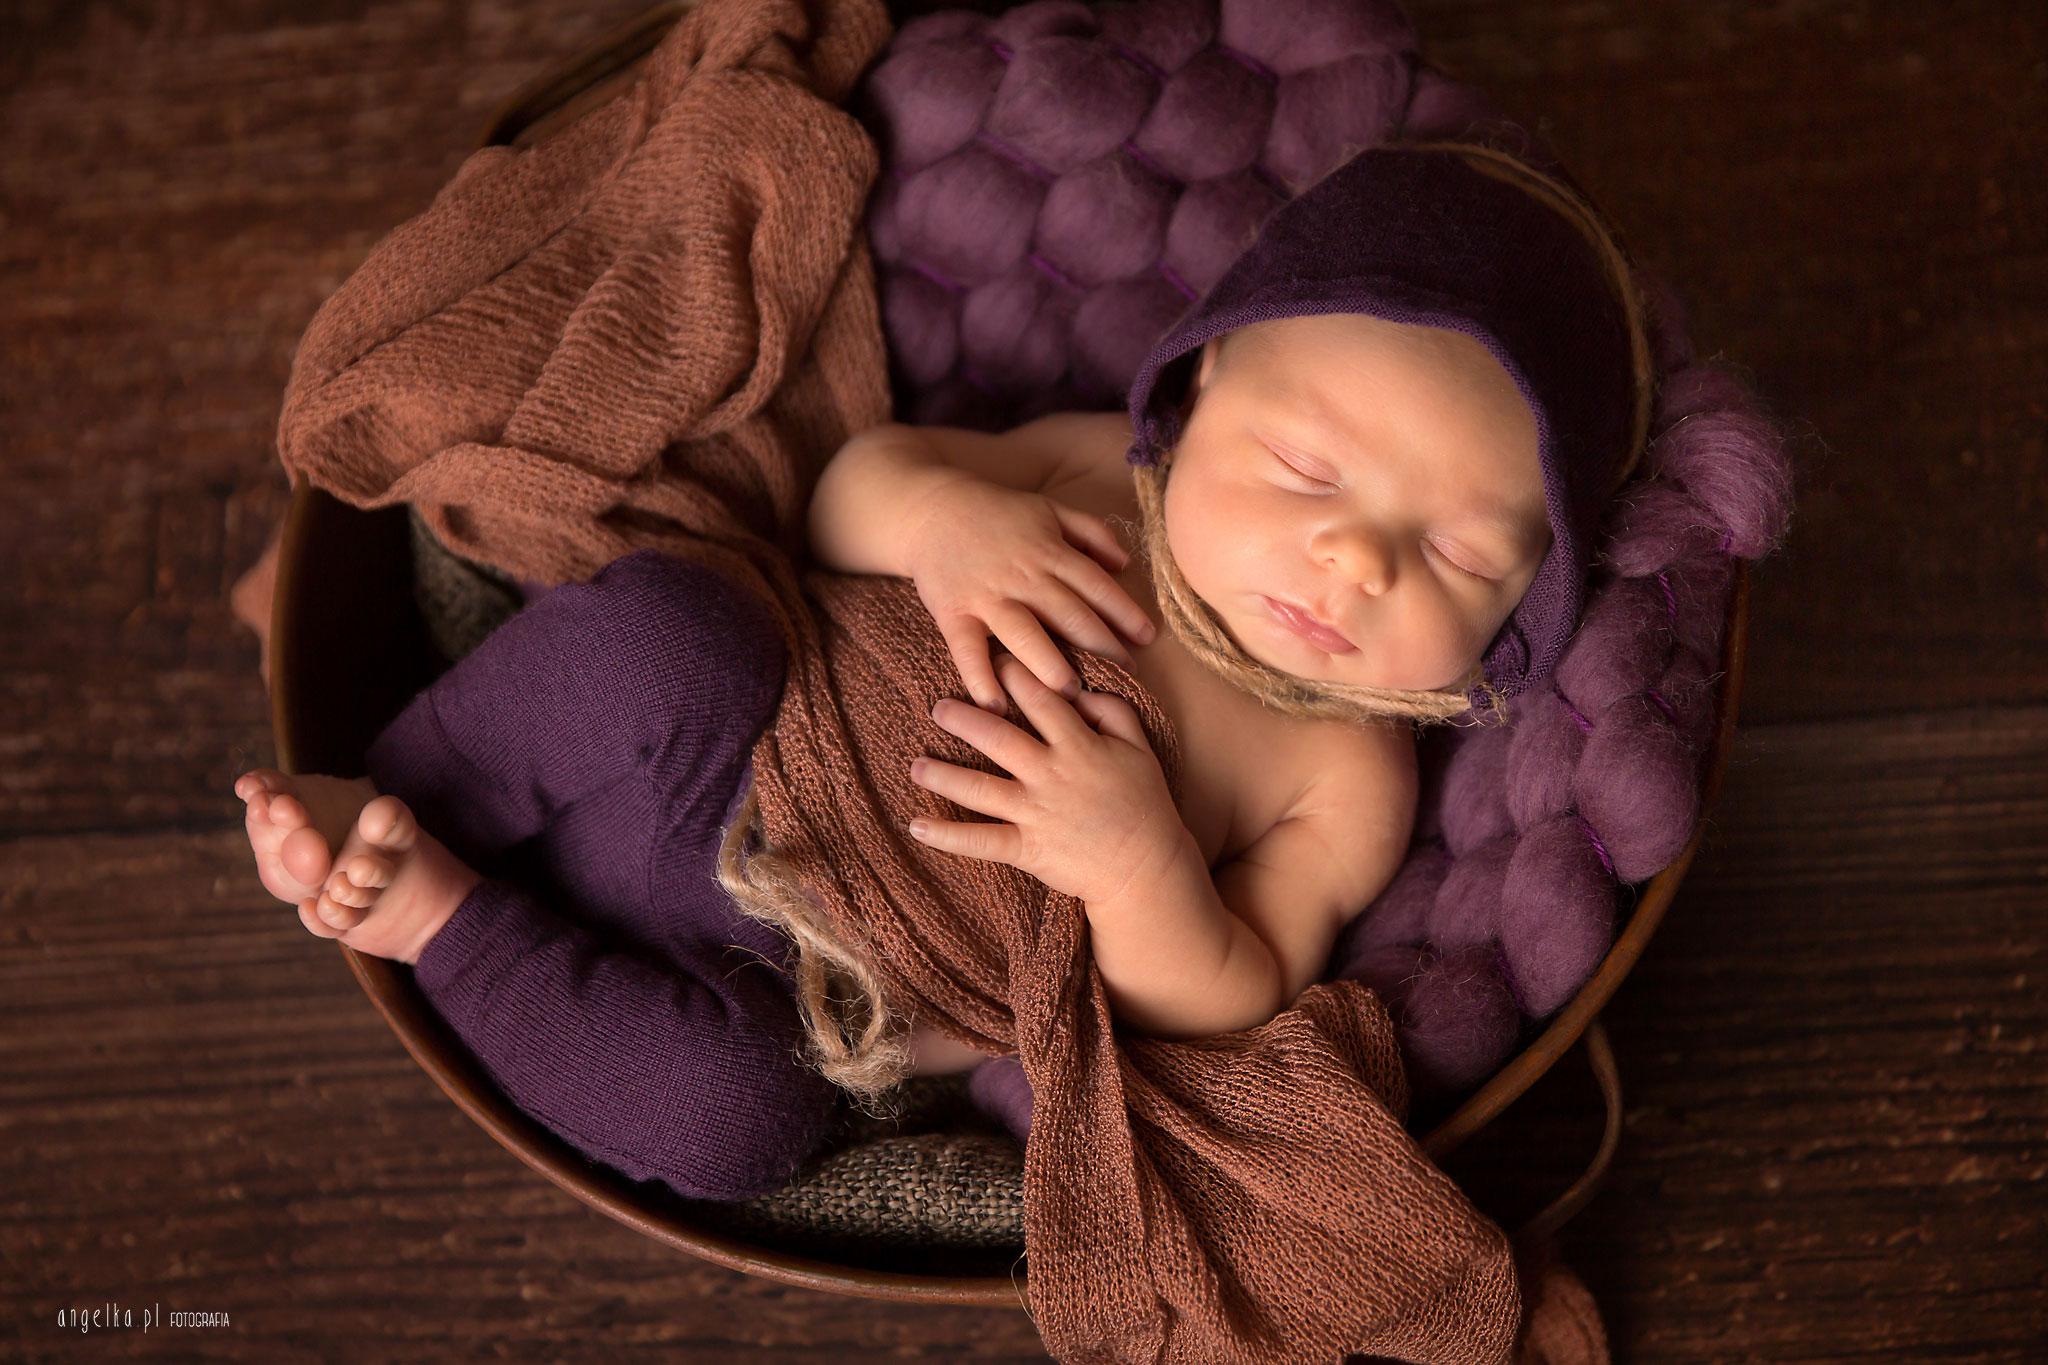 noworodek wfioletach